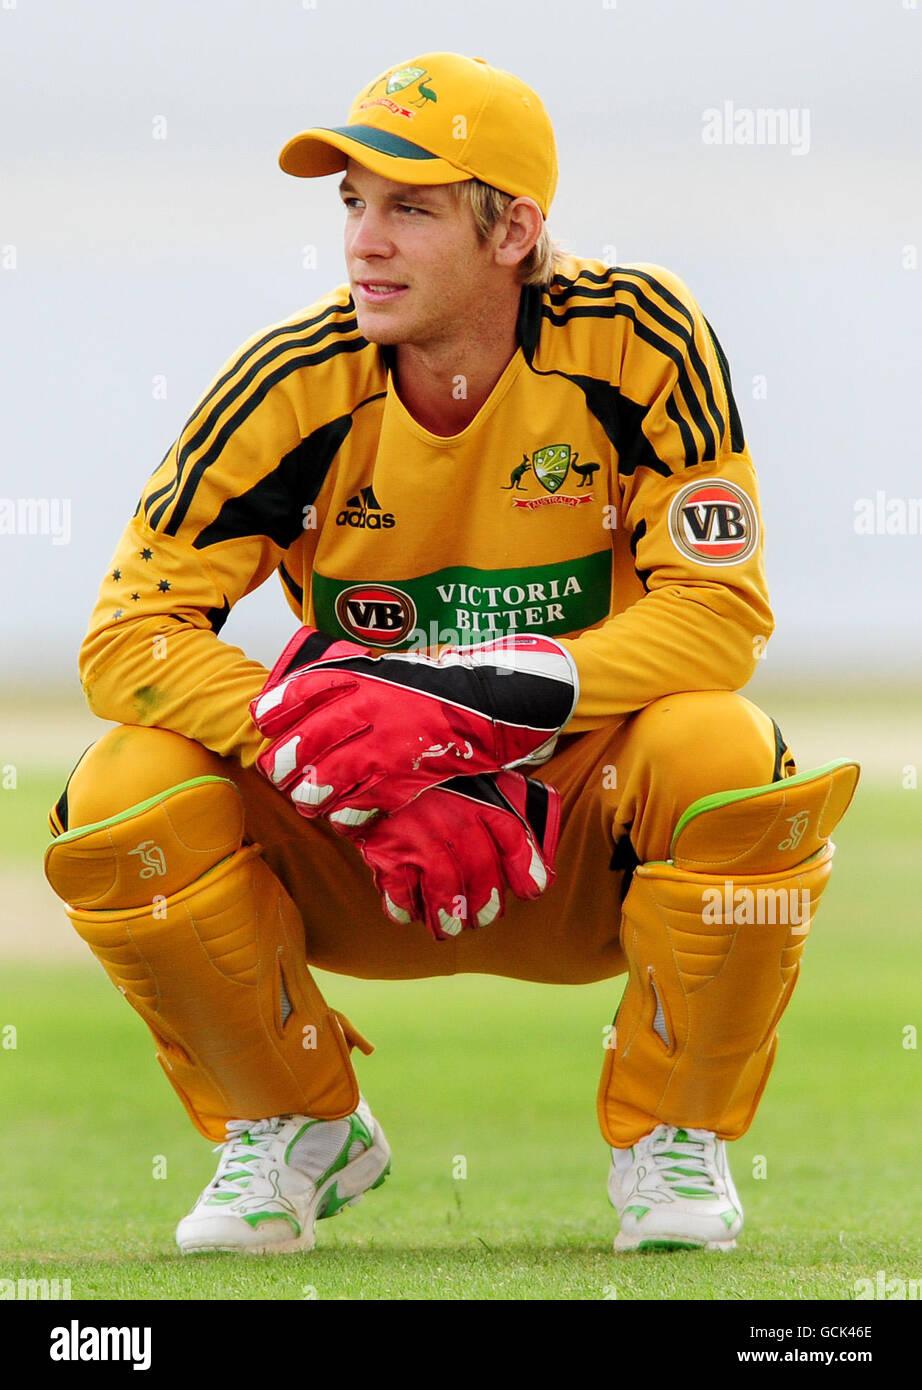 Australia Wicketkeeper Tim Paine During The First Twenty20 Stock Photo Alamy